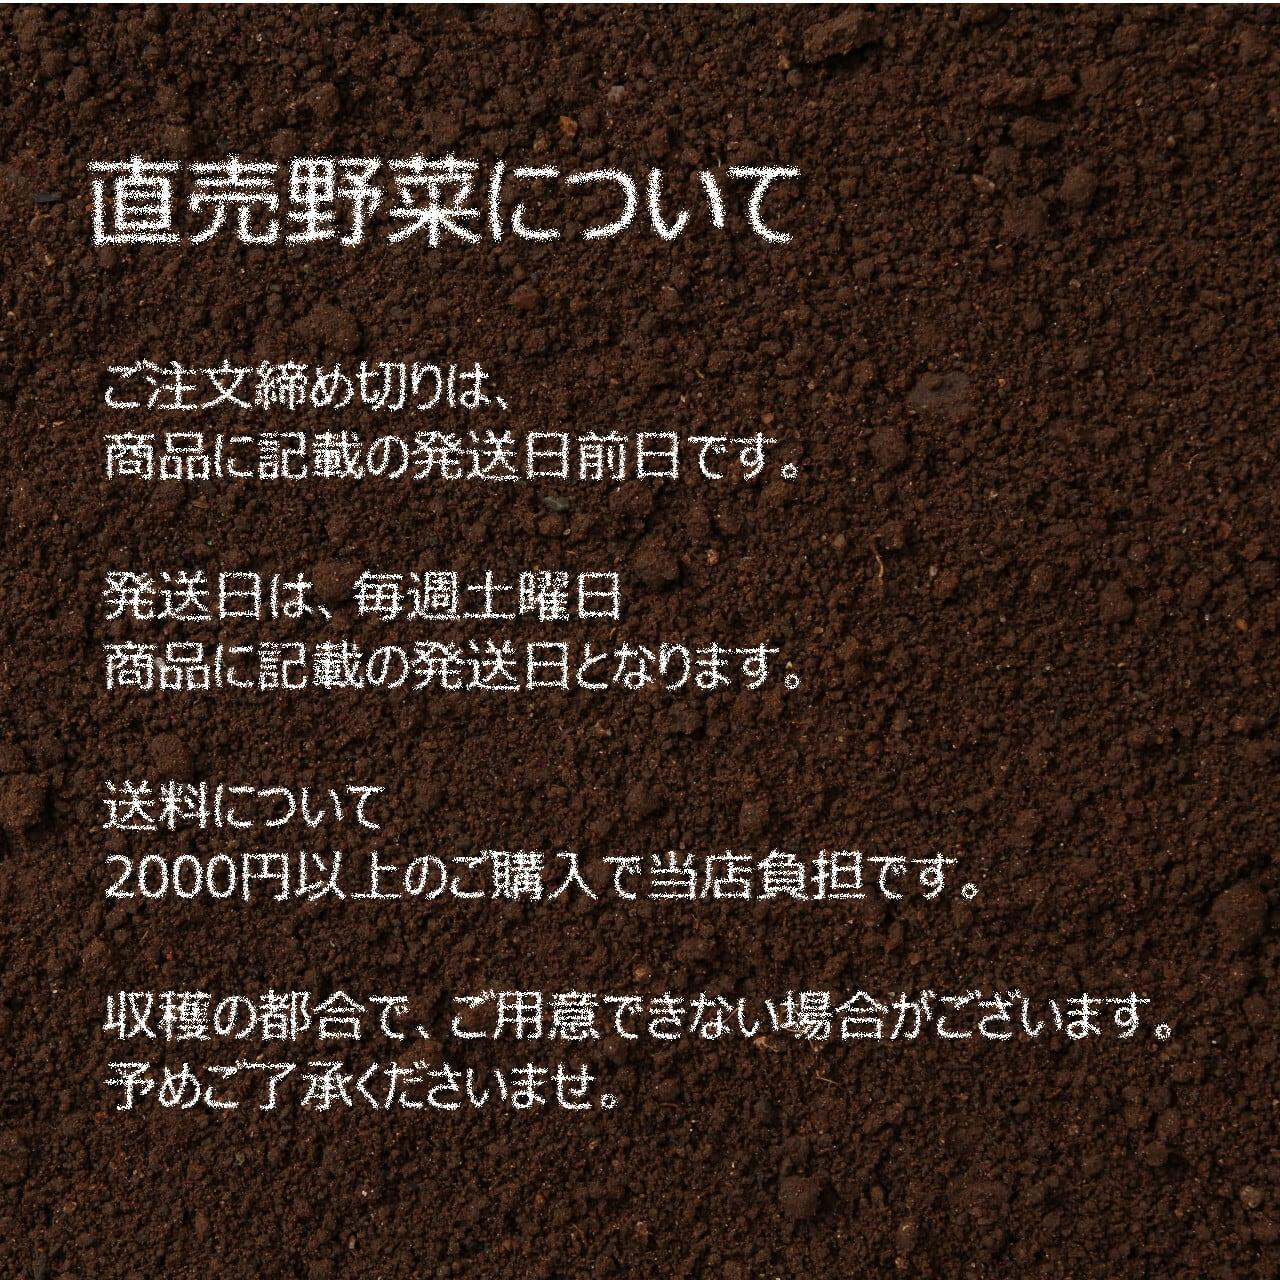 春菊 約200g : 6月の朝採り直売野菜 春の新鮮野菜 6月13日発送予定